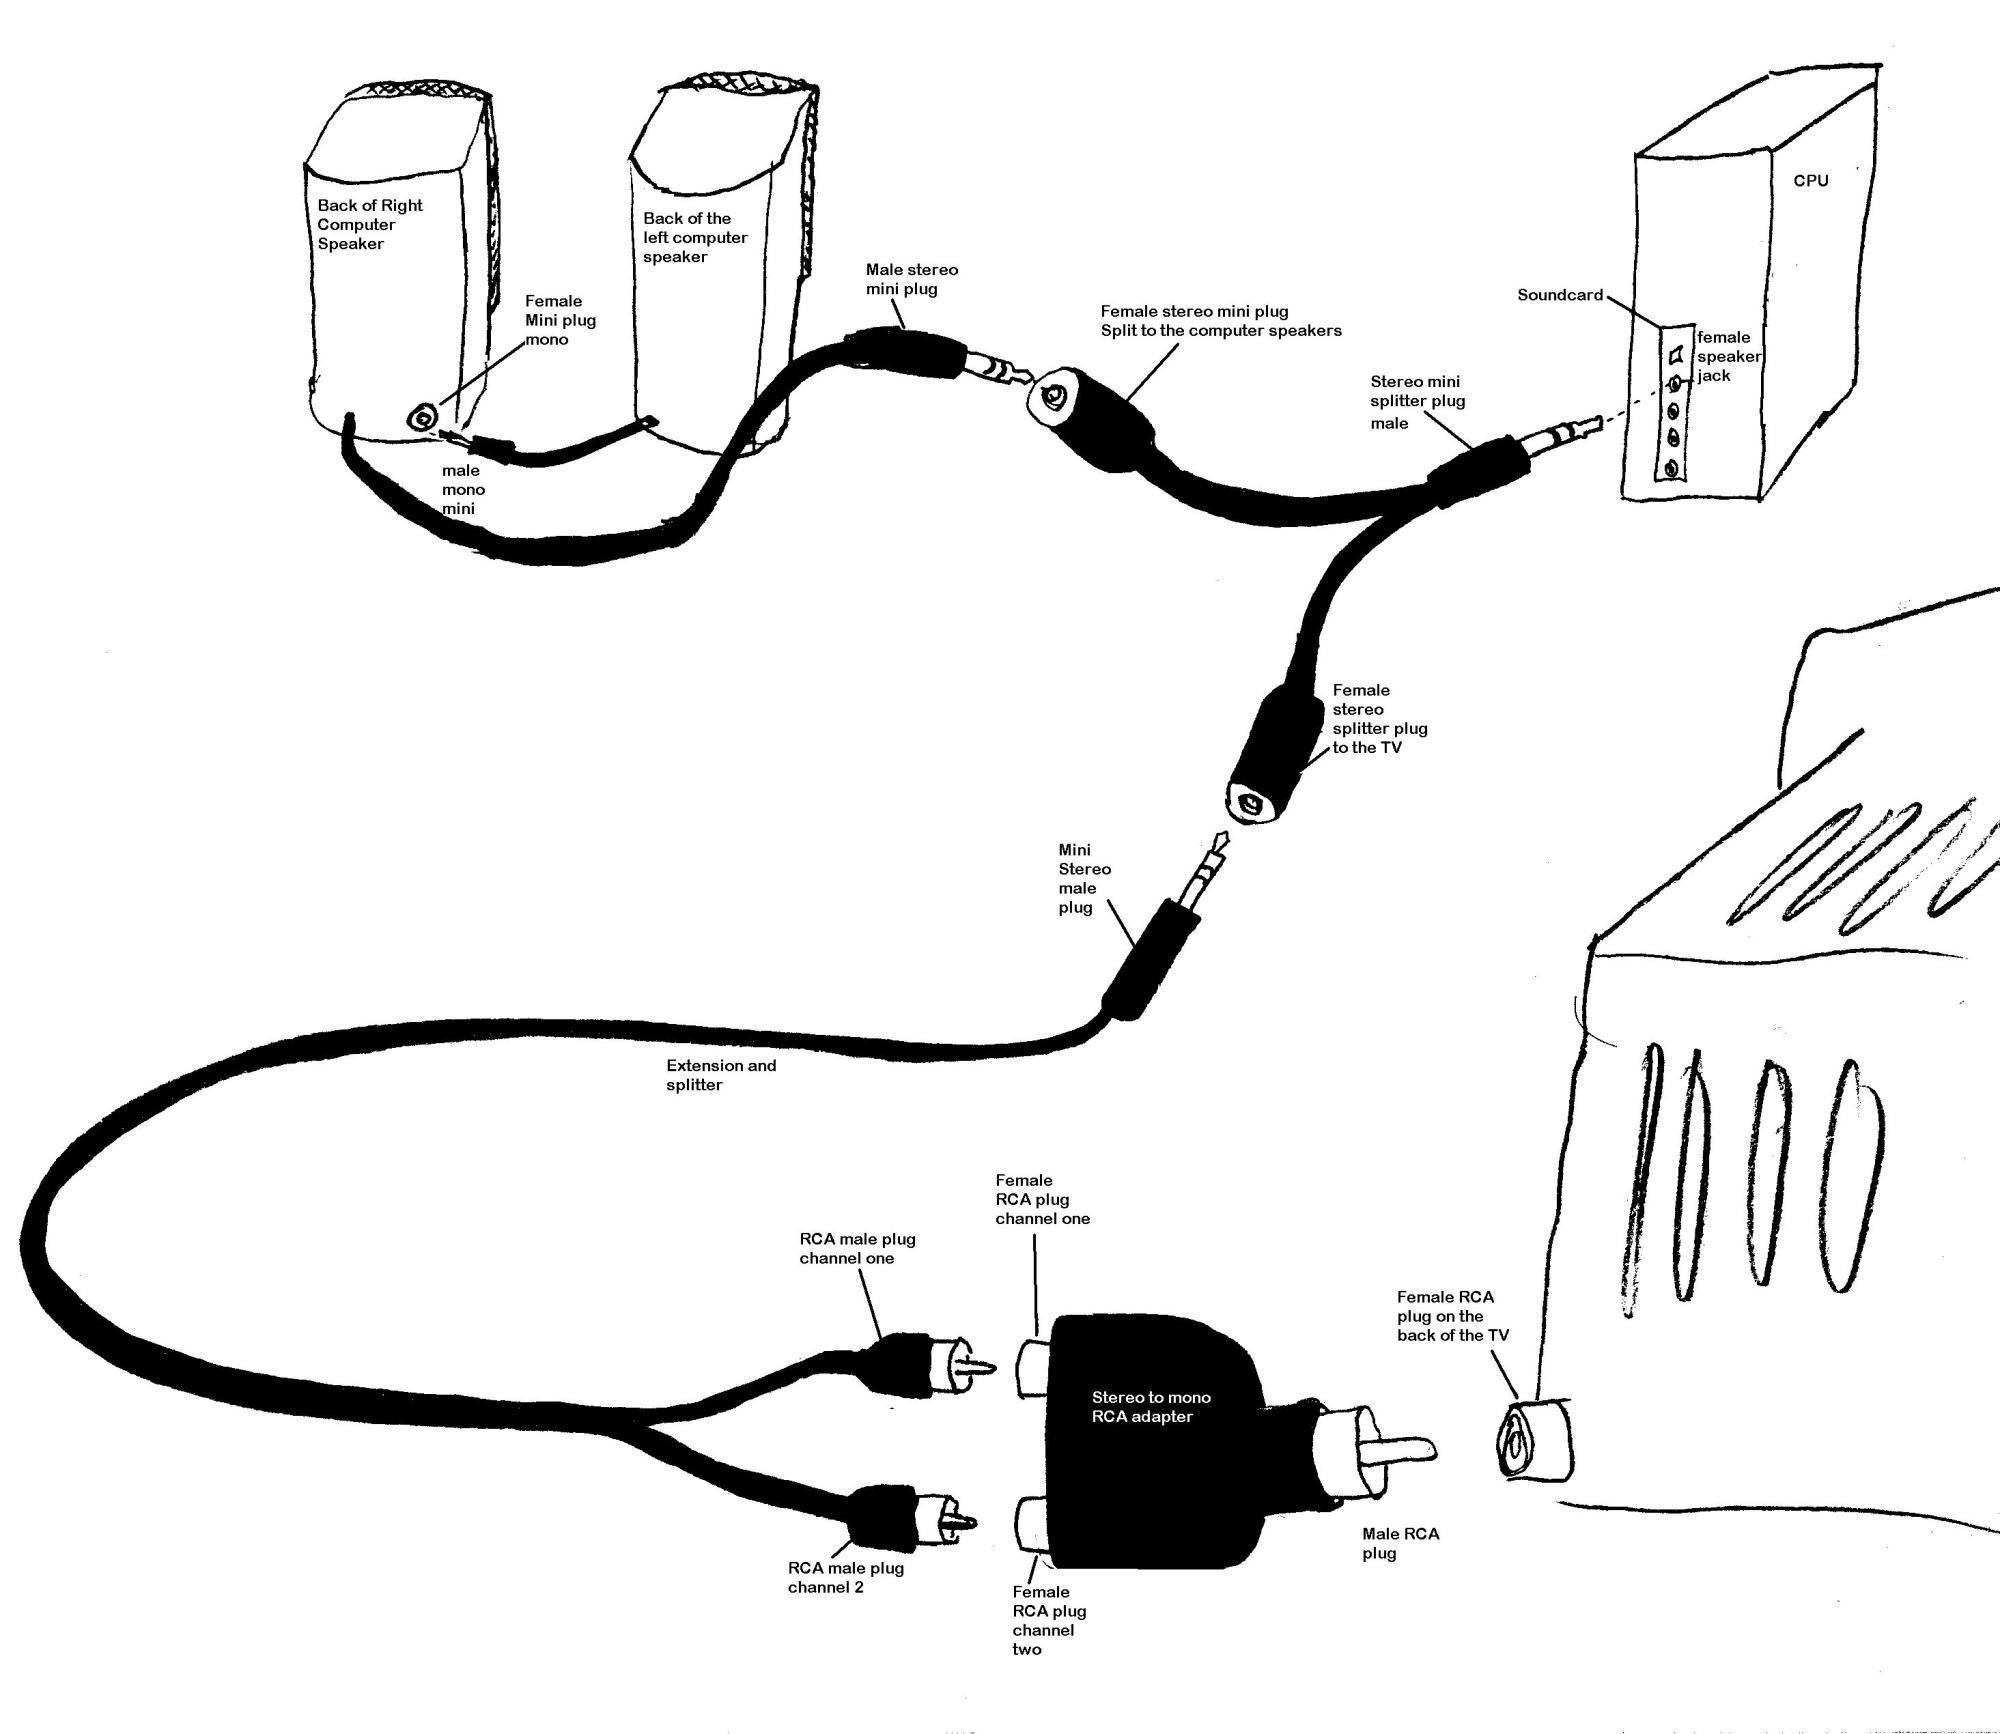 hight resolution of pc speaker wiring diagram wiring diagrams rh 27 treatchildtrauma de subwoofer speaker wiring diagram toy speaker